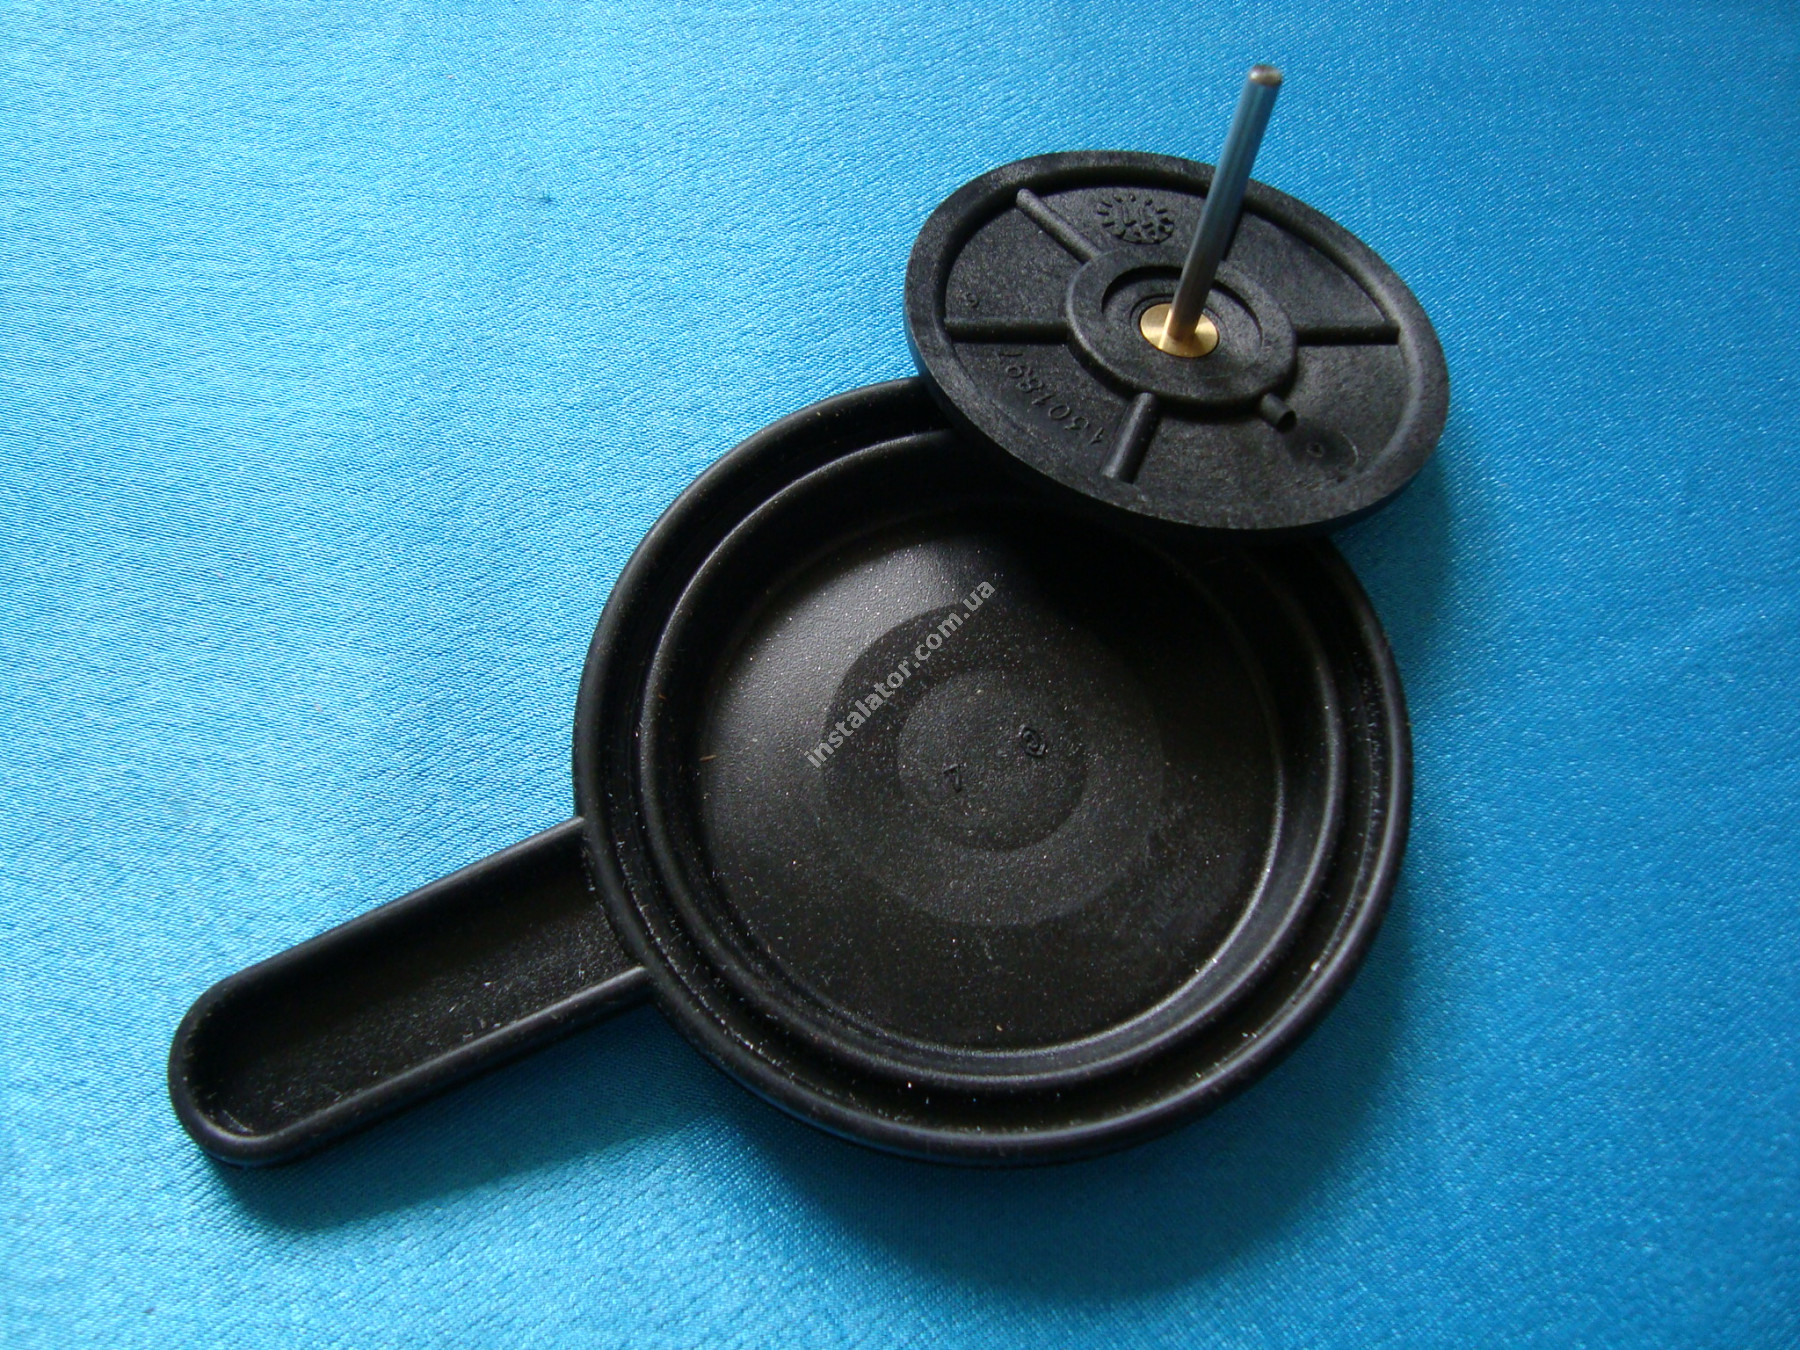 60081977 Ремкомплект мембрани 3-х ходового клапана CHAFFOTEAUX ELEXIA full-image-2